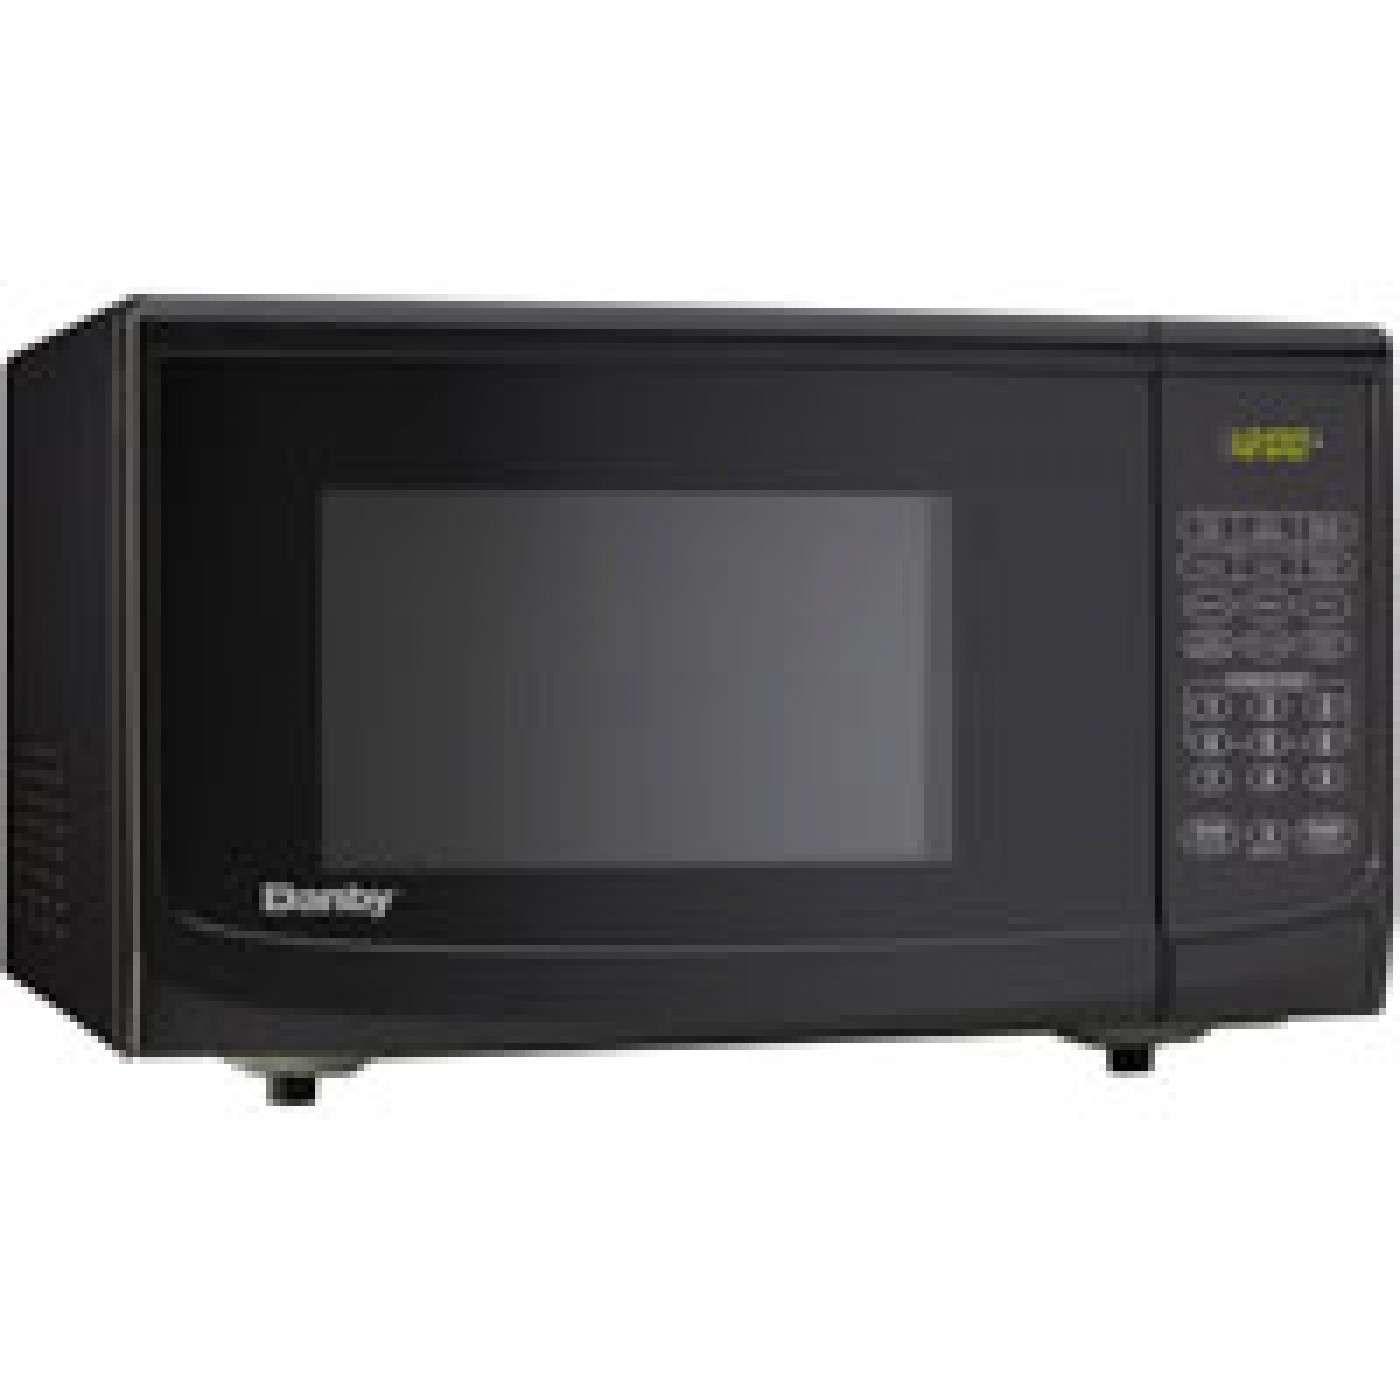 18 Inch Microwave Bestmicrowave